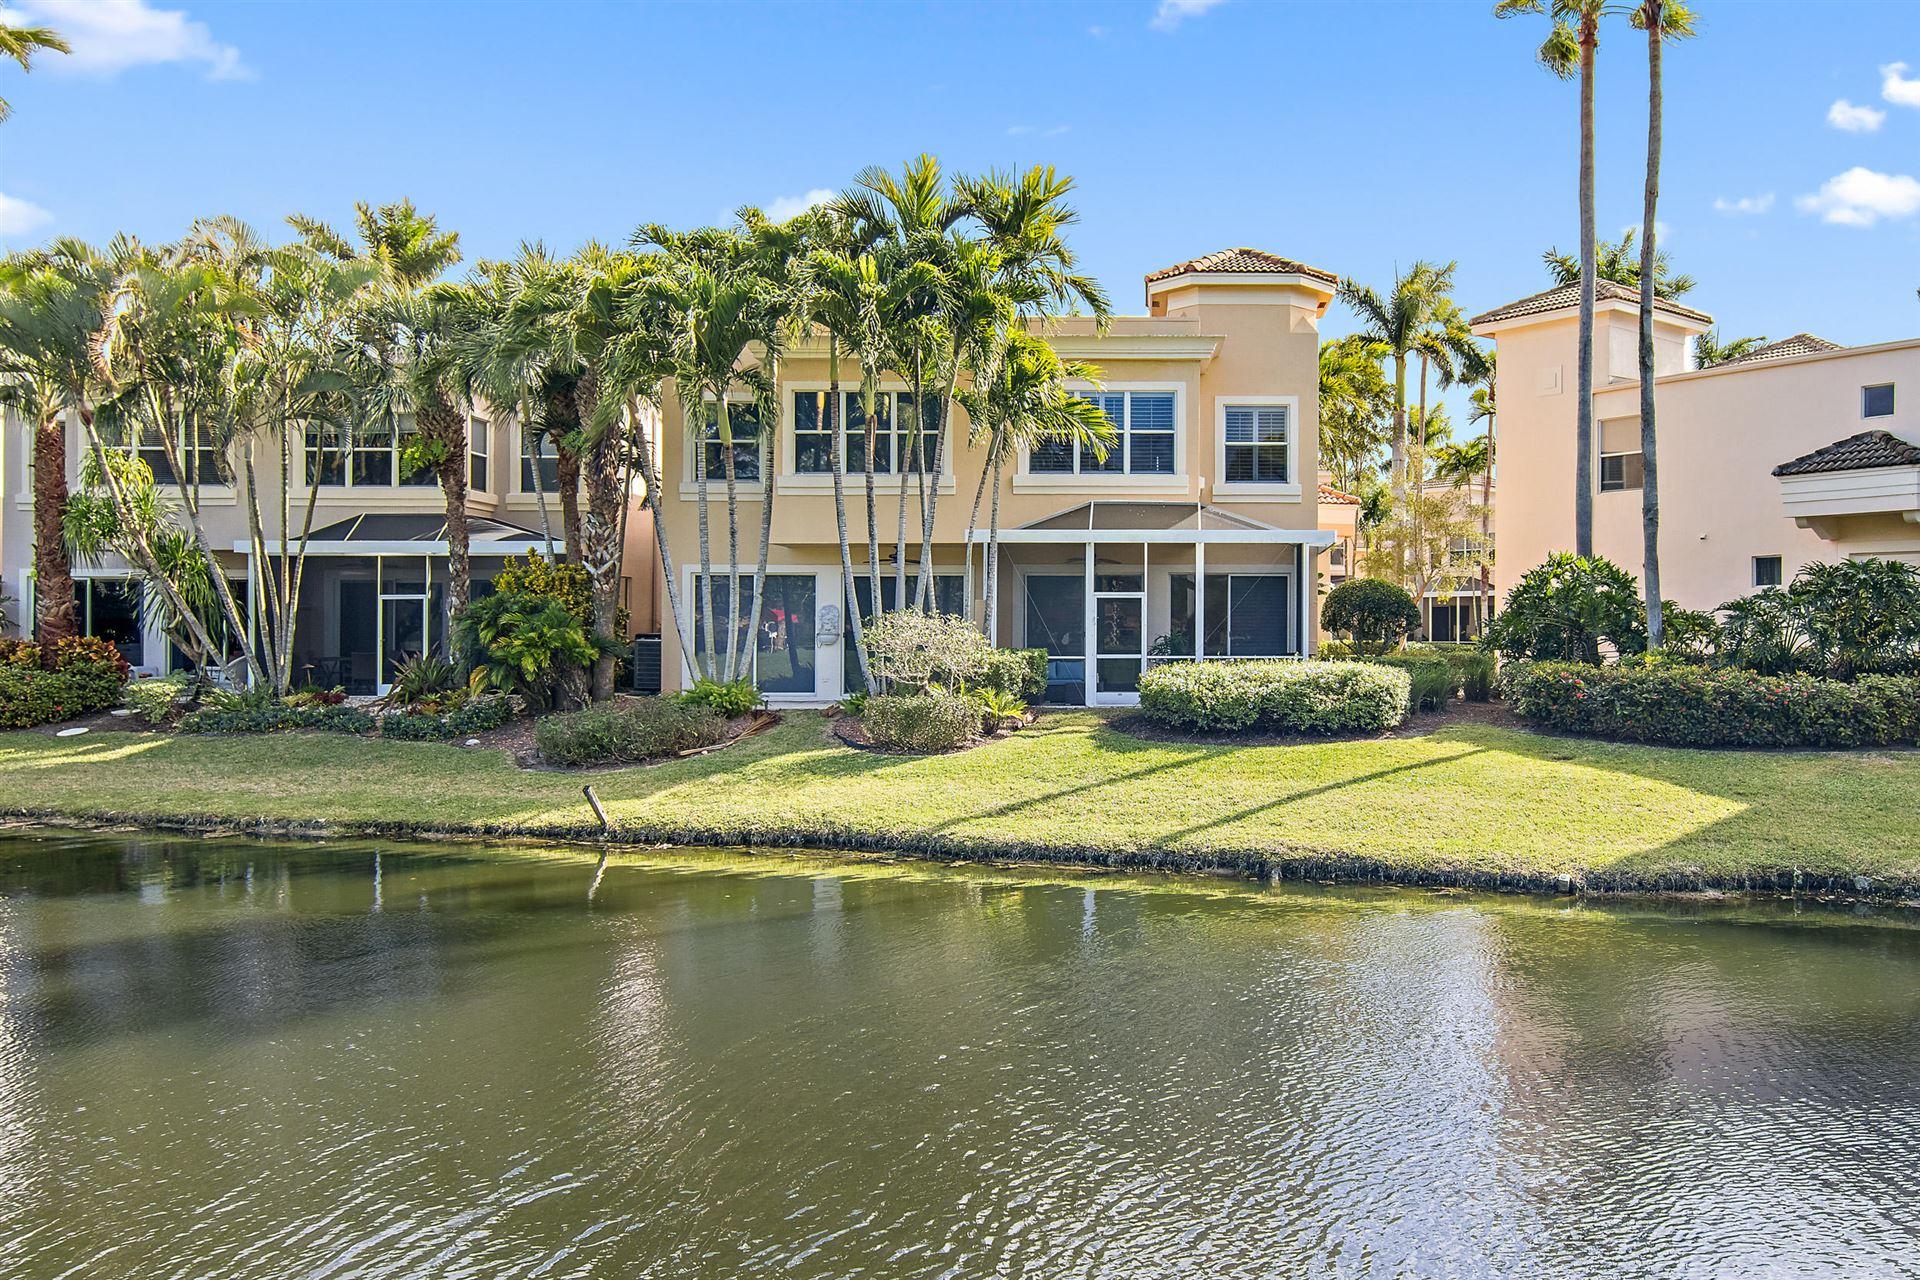 501 Resort Lane, Palm Beach Gardens, FL 33418 - #: RX-10700435